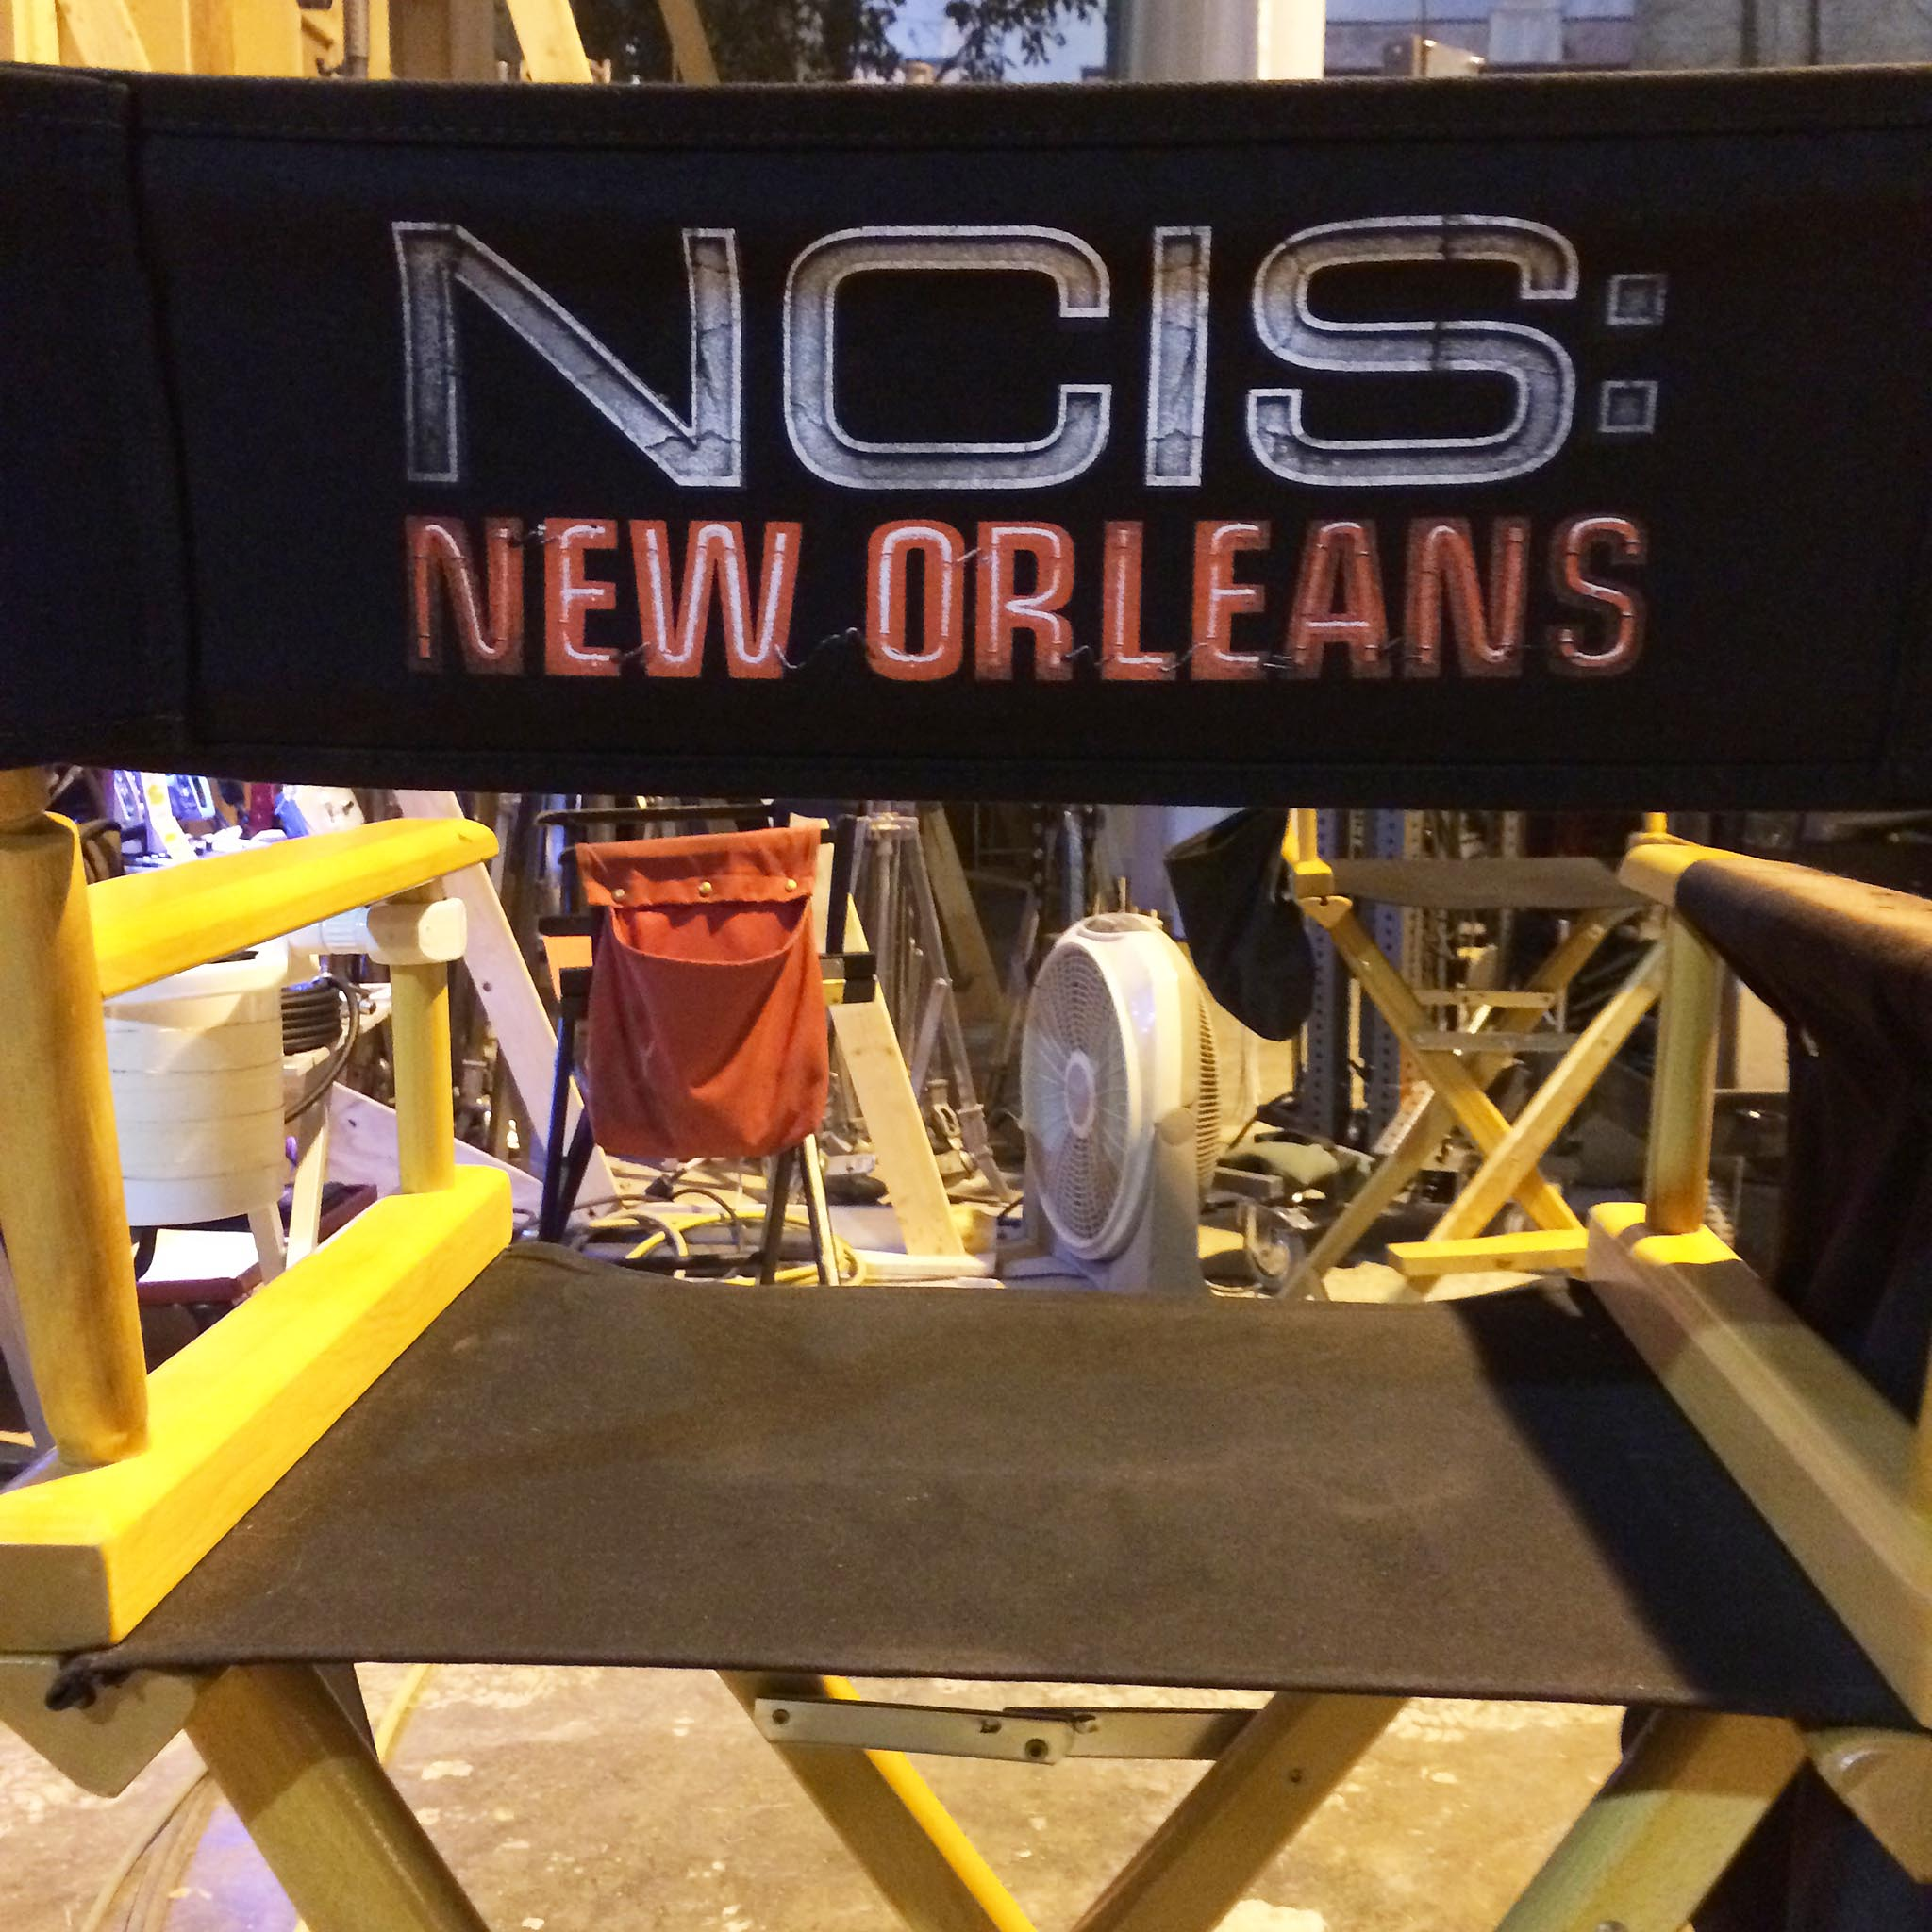 on-set-ncis-chair1.jpg